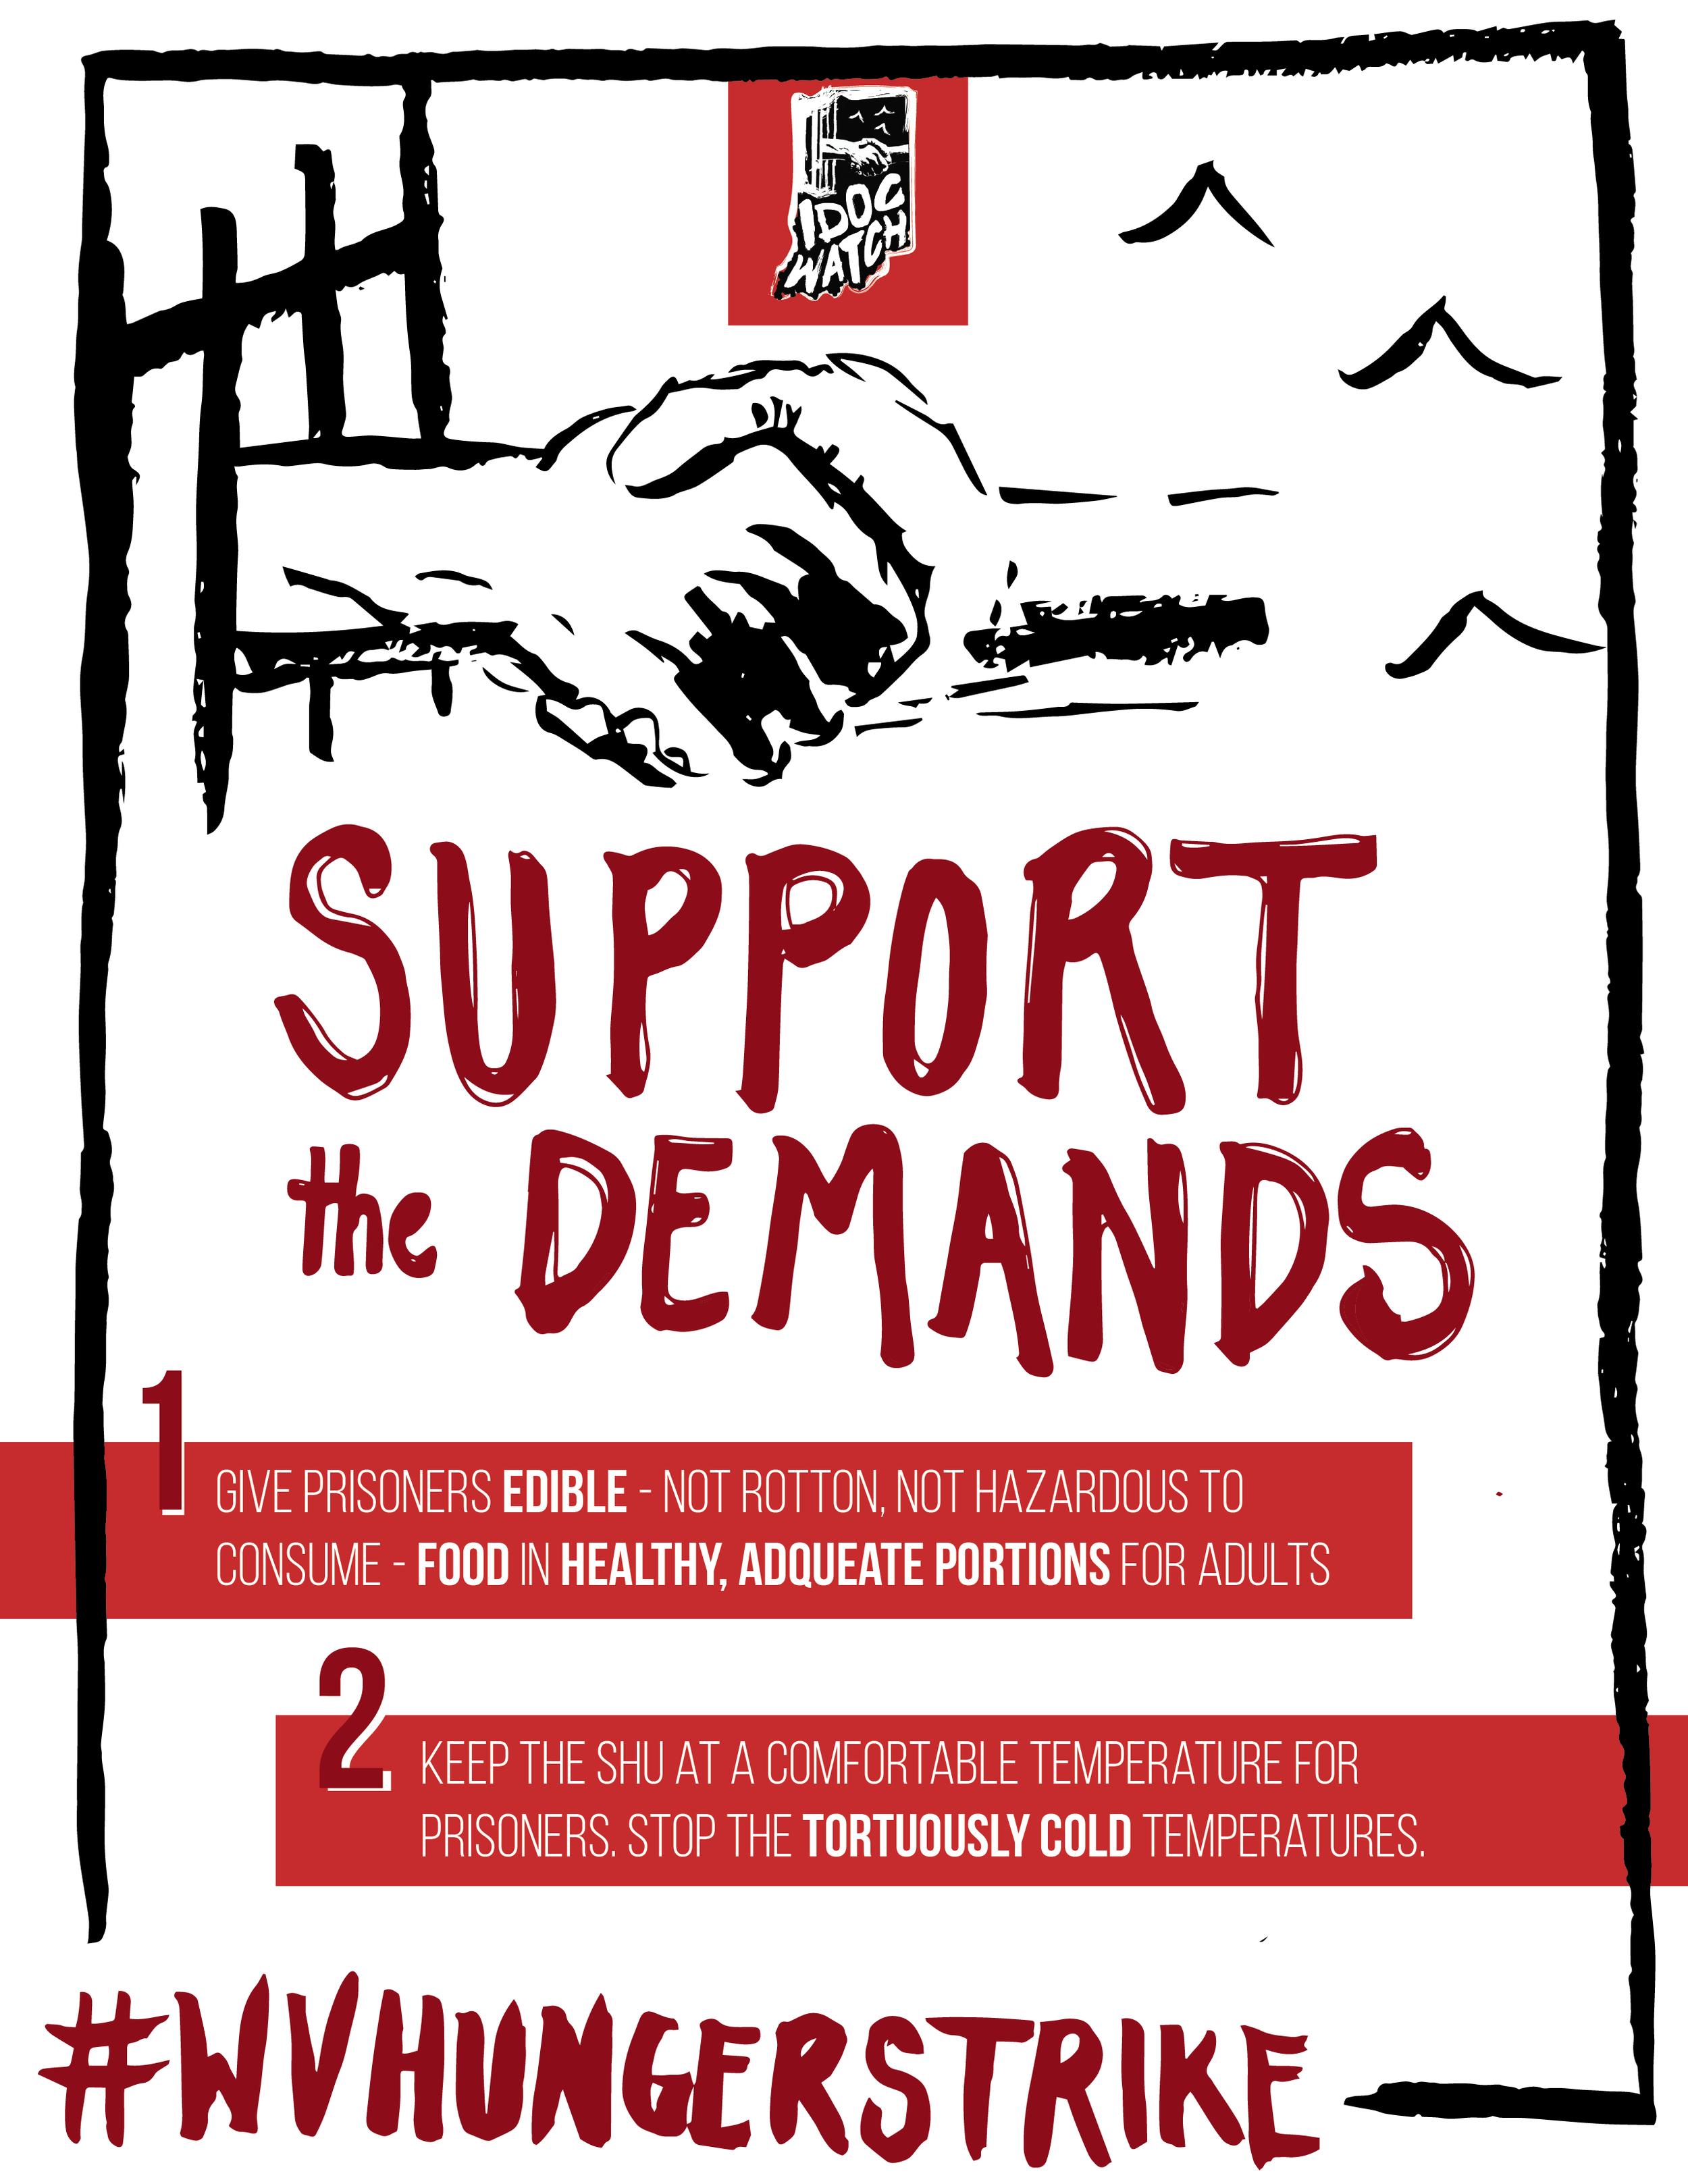 support demands-01.png